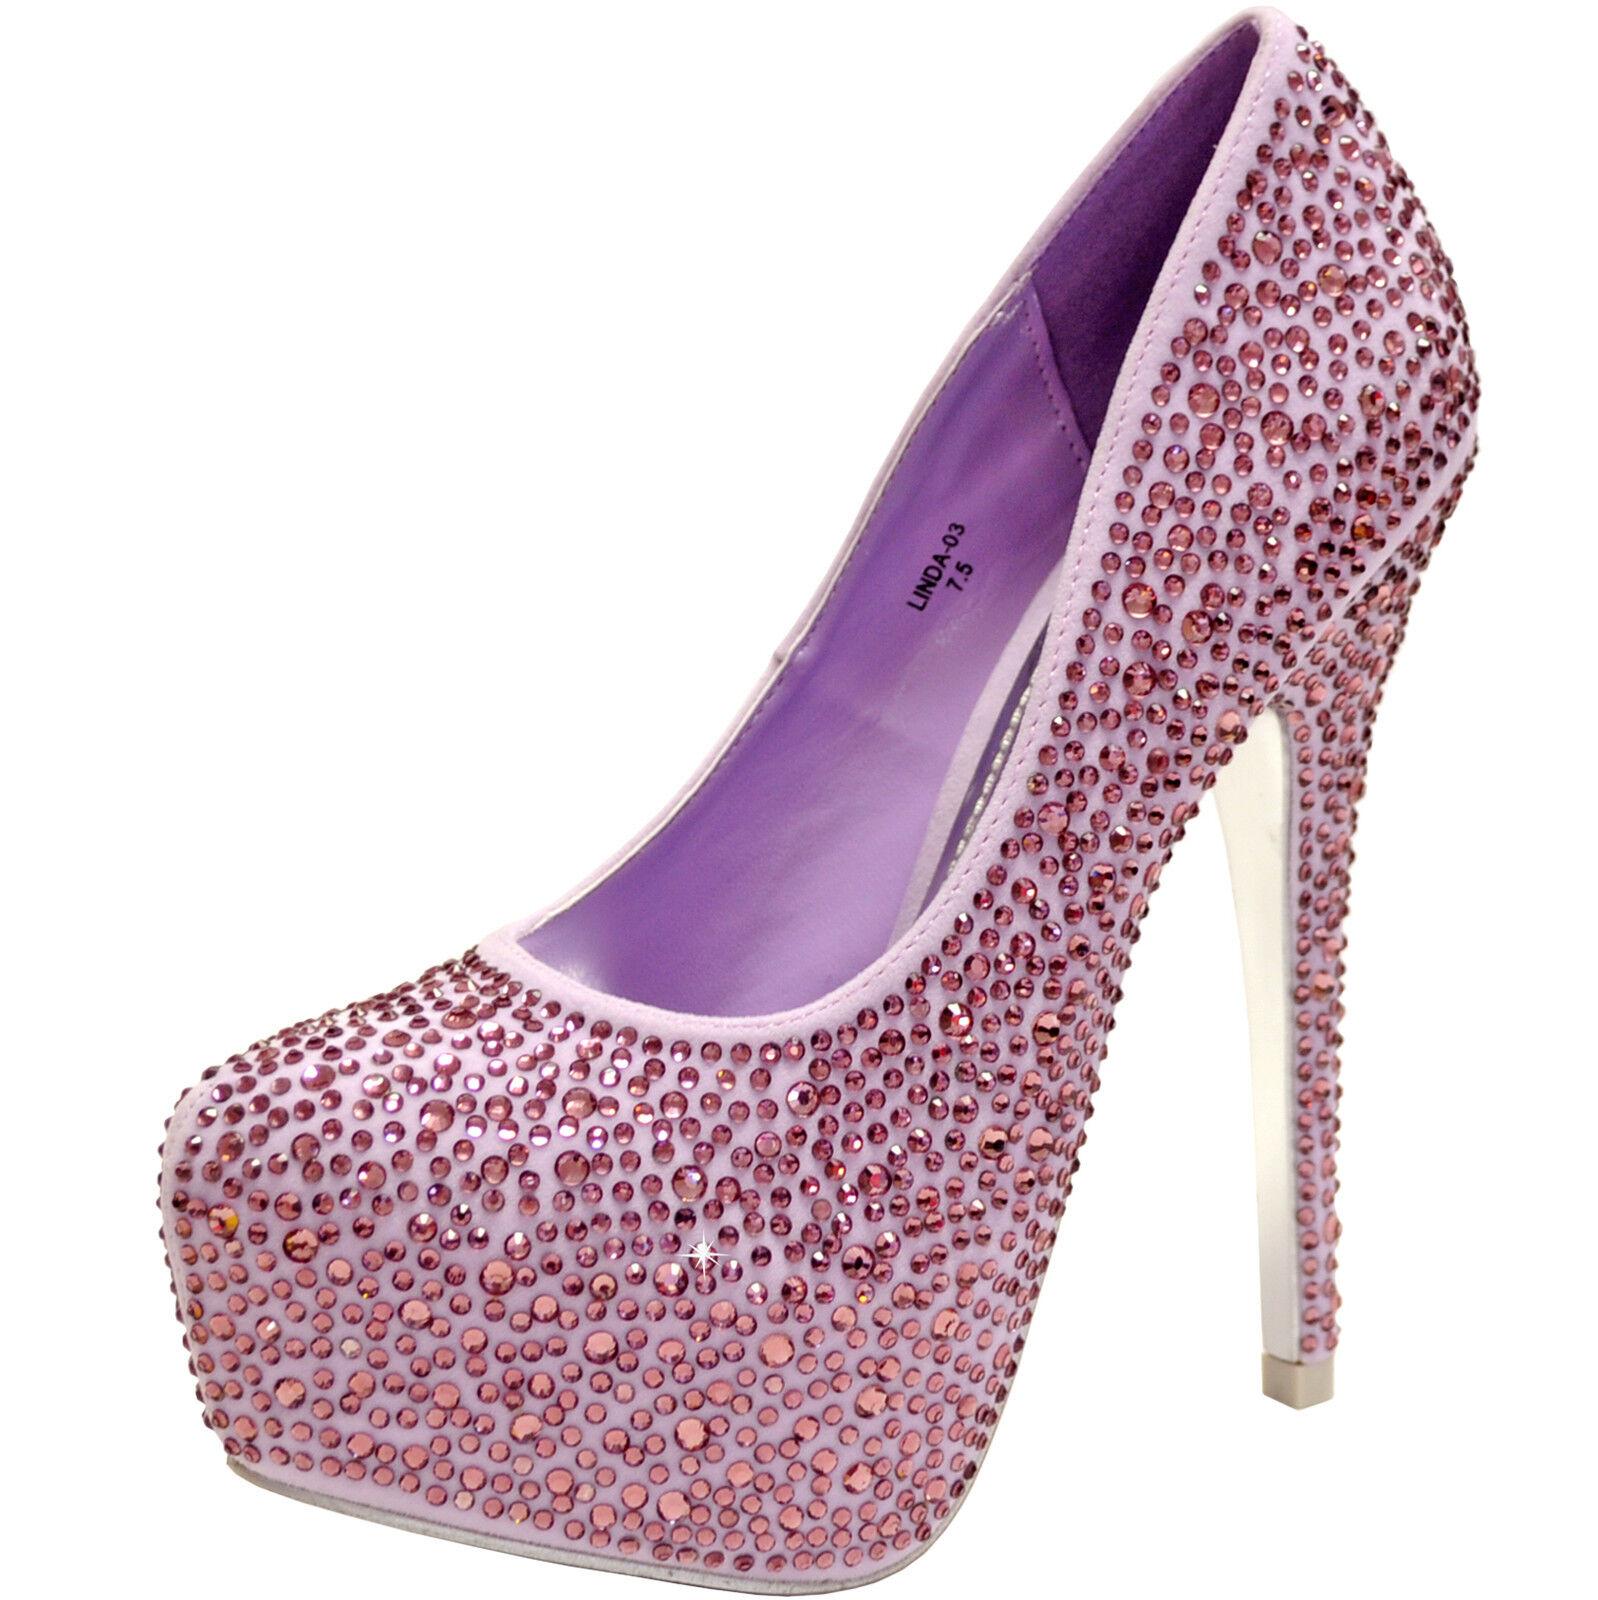 New damen schuhe evening stilettos blink rhinestones prom wedding formal lilac